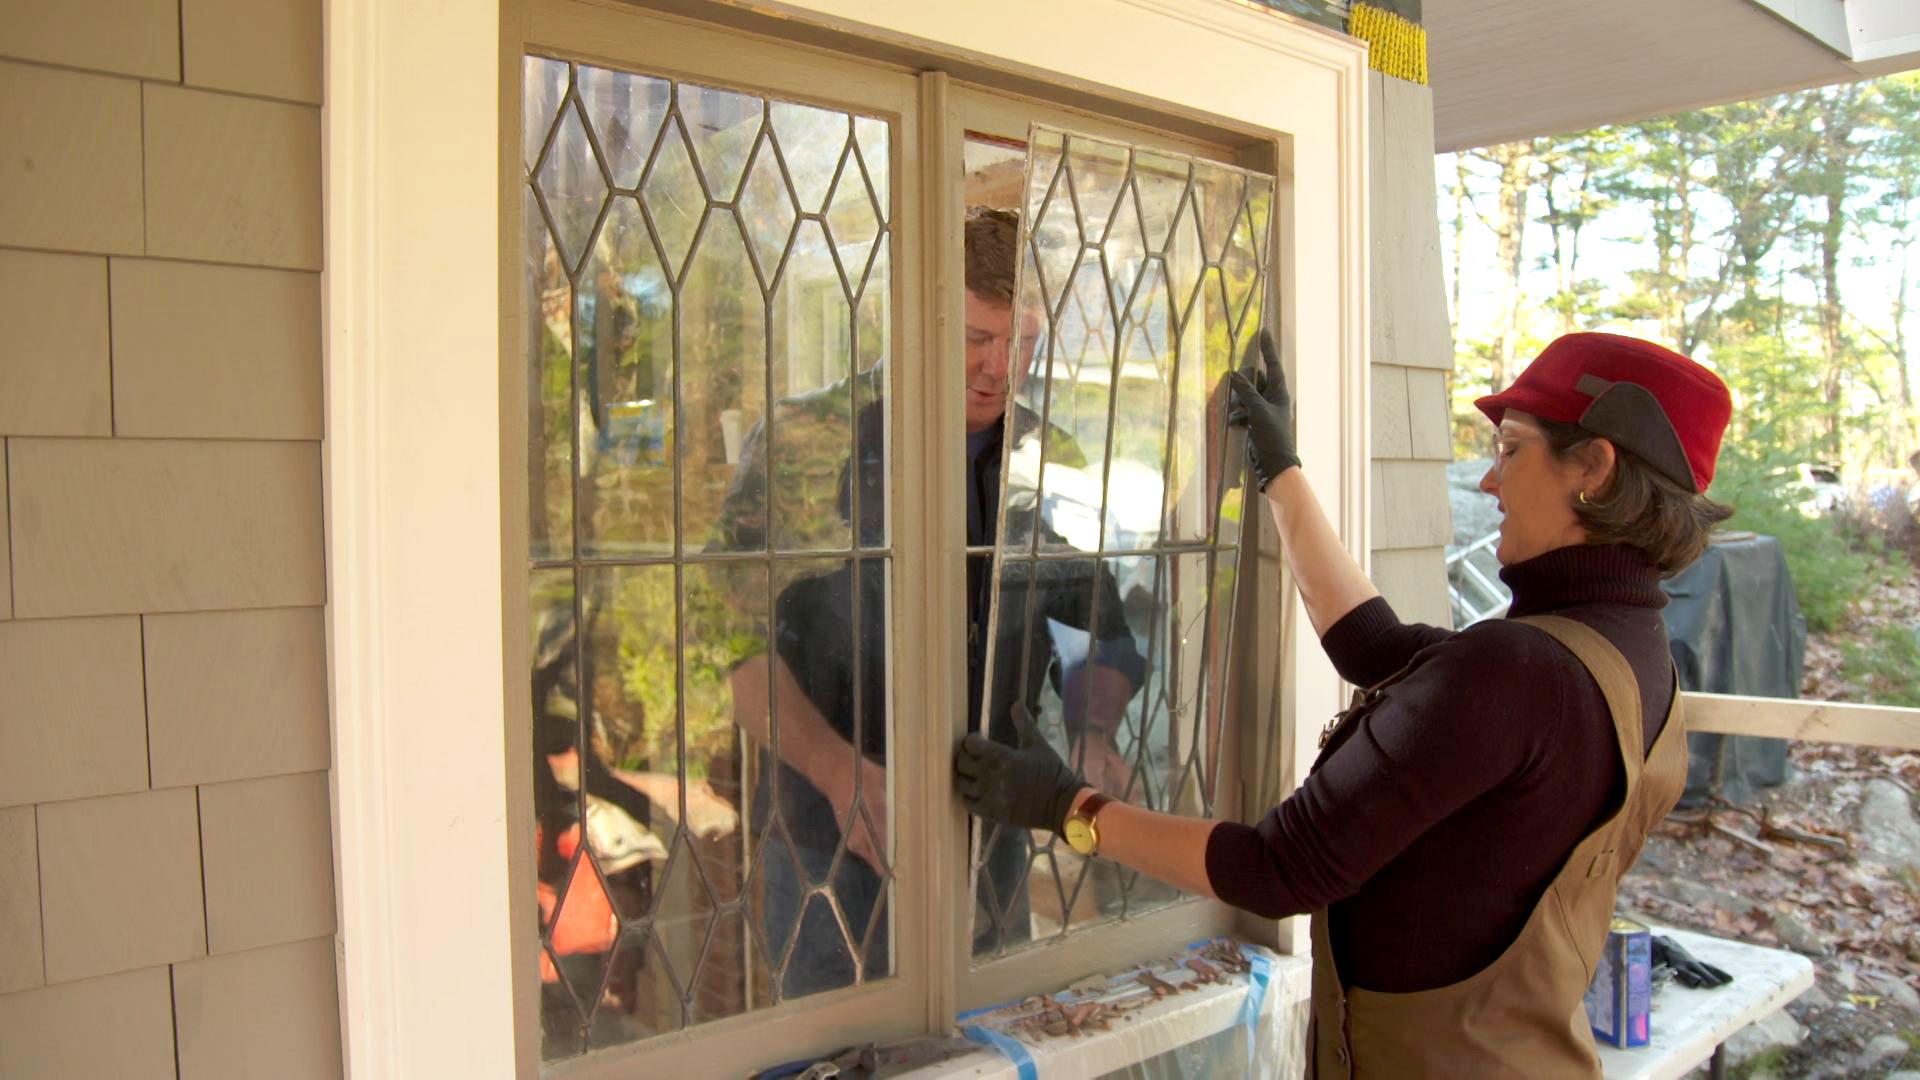 Repairing leaded glass windows.